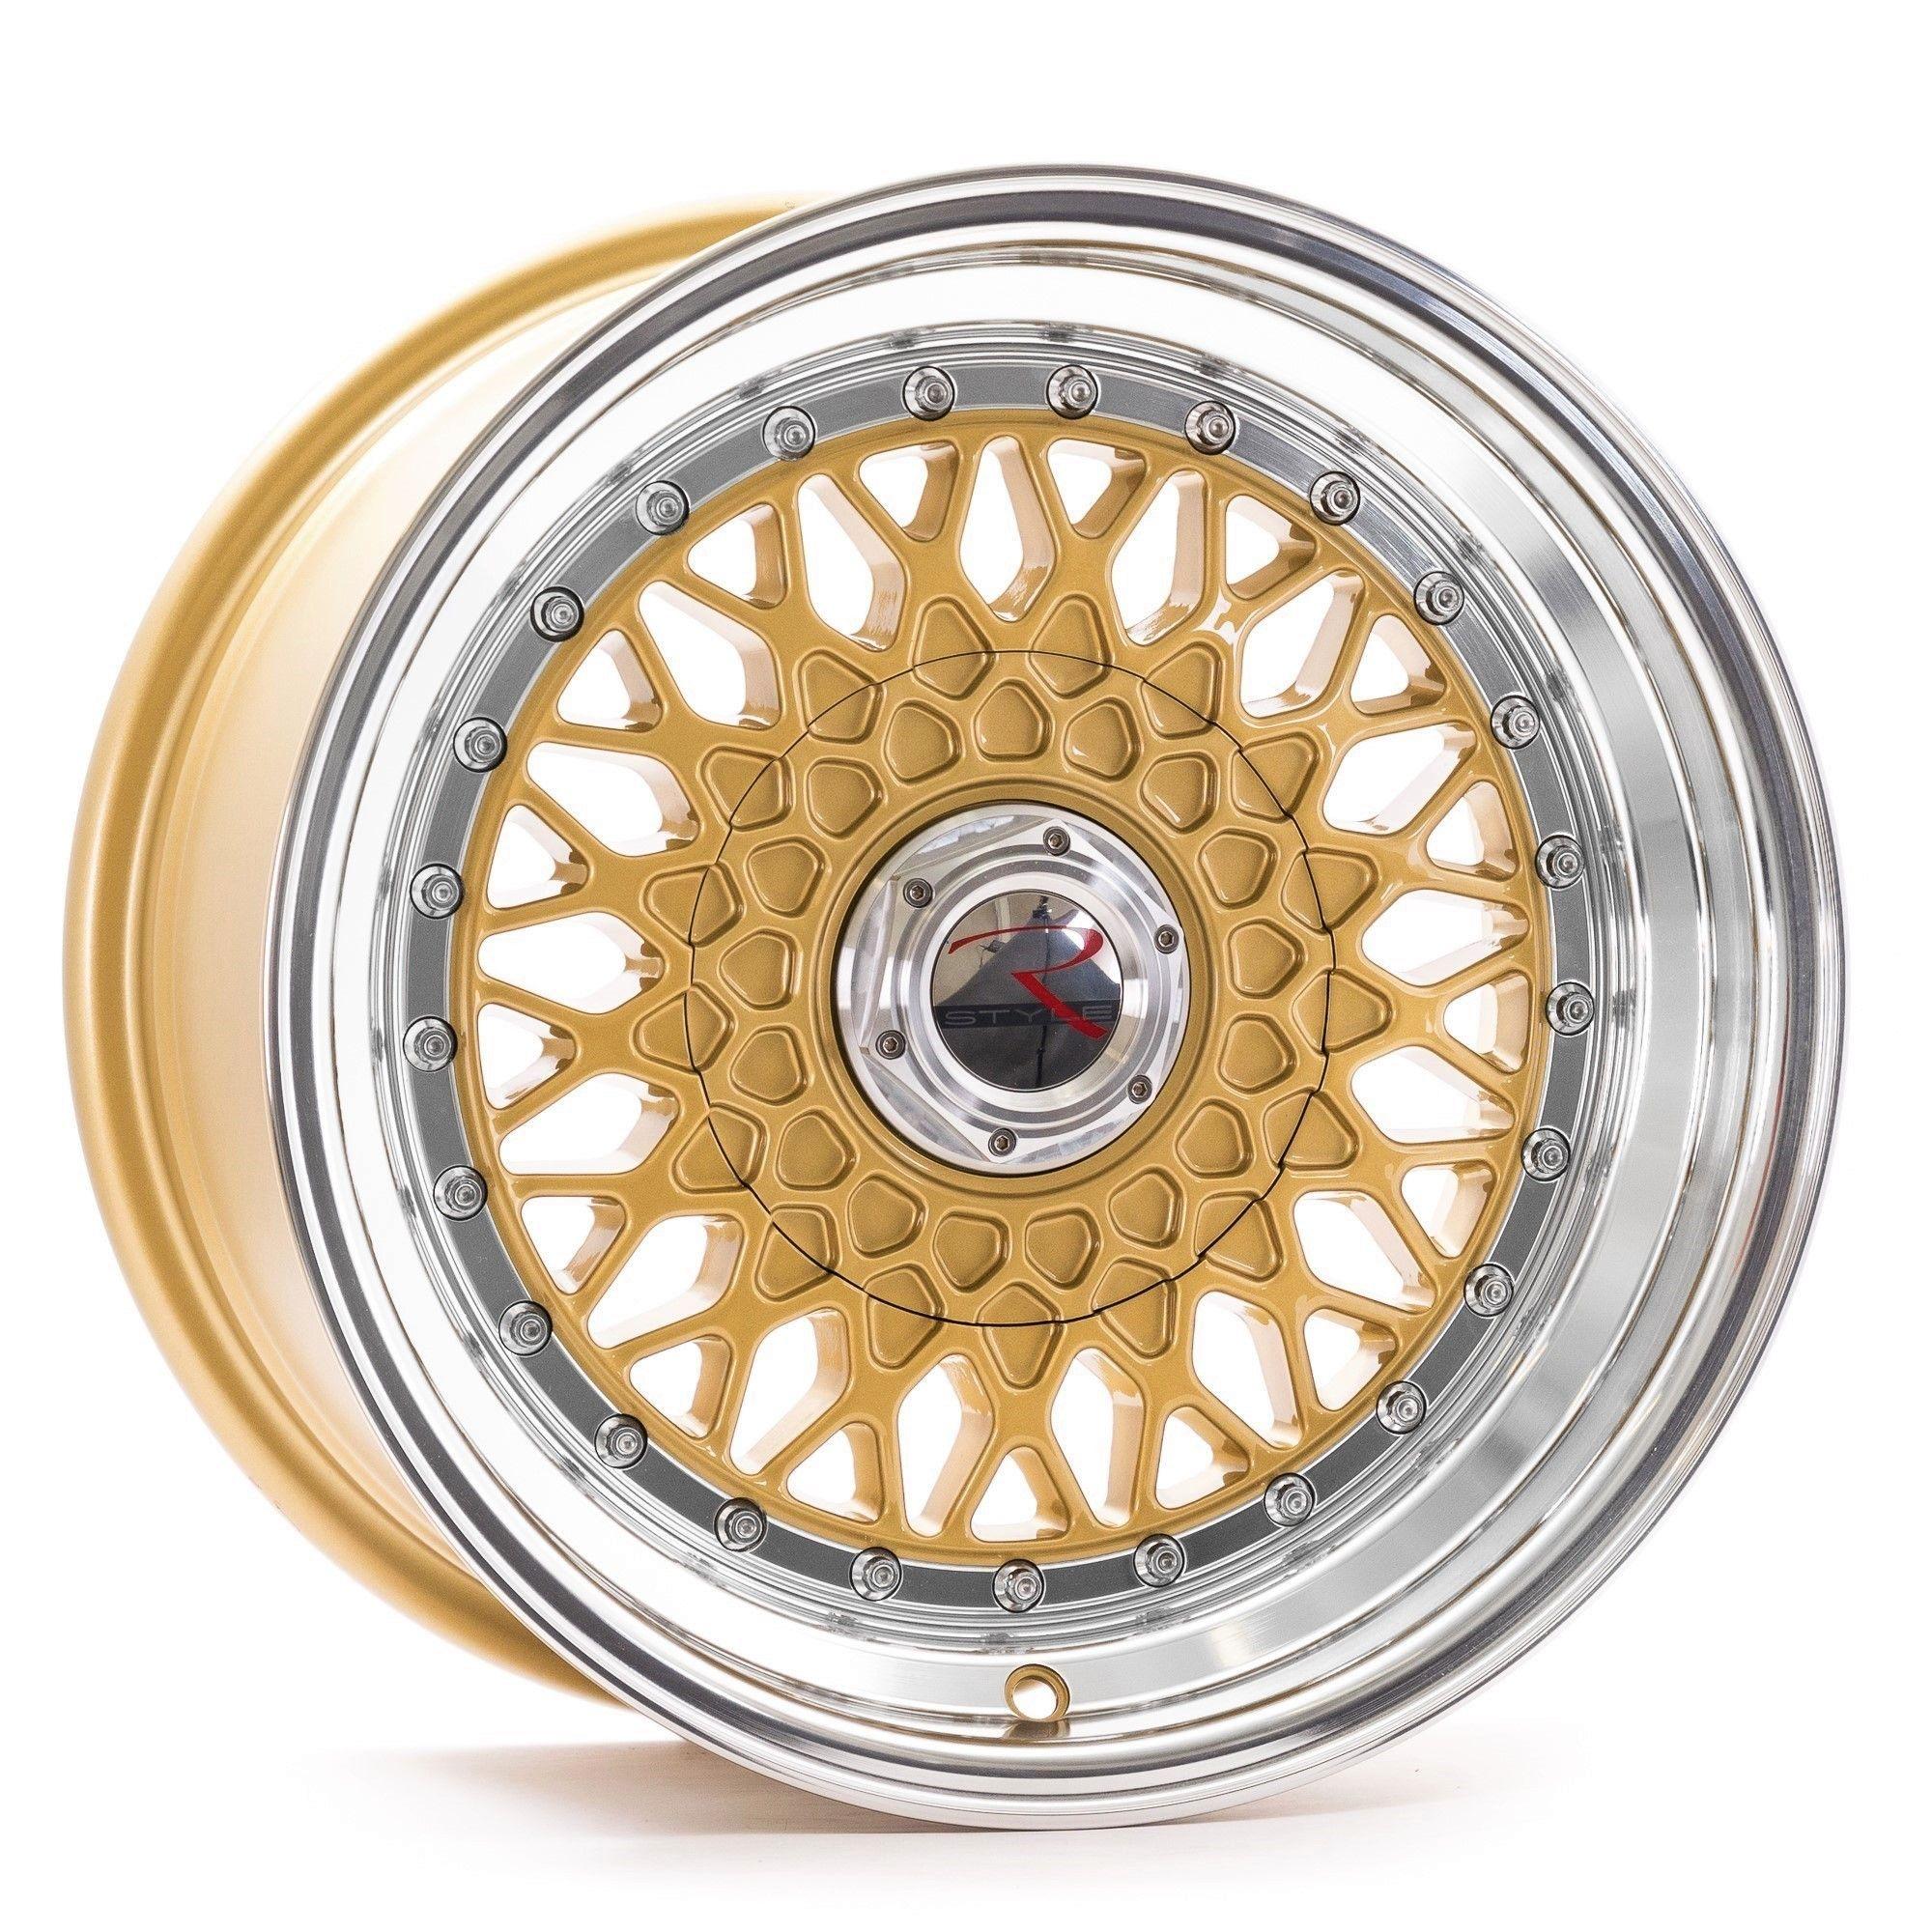 rstyle wheels rs01 felgen gold horn polished in 15 zoll. Black Bedroom Furniture Sets. Home Design Ideas